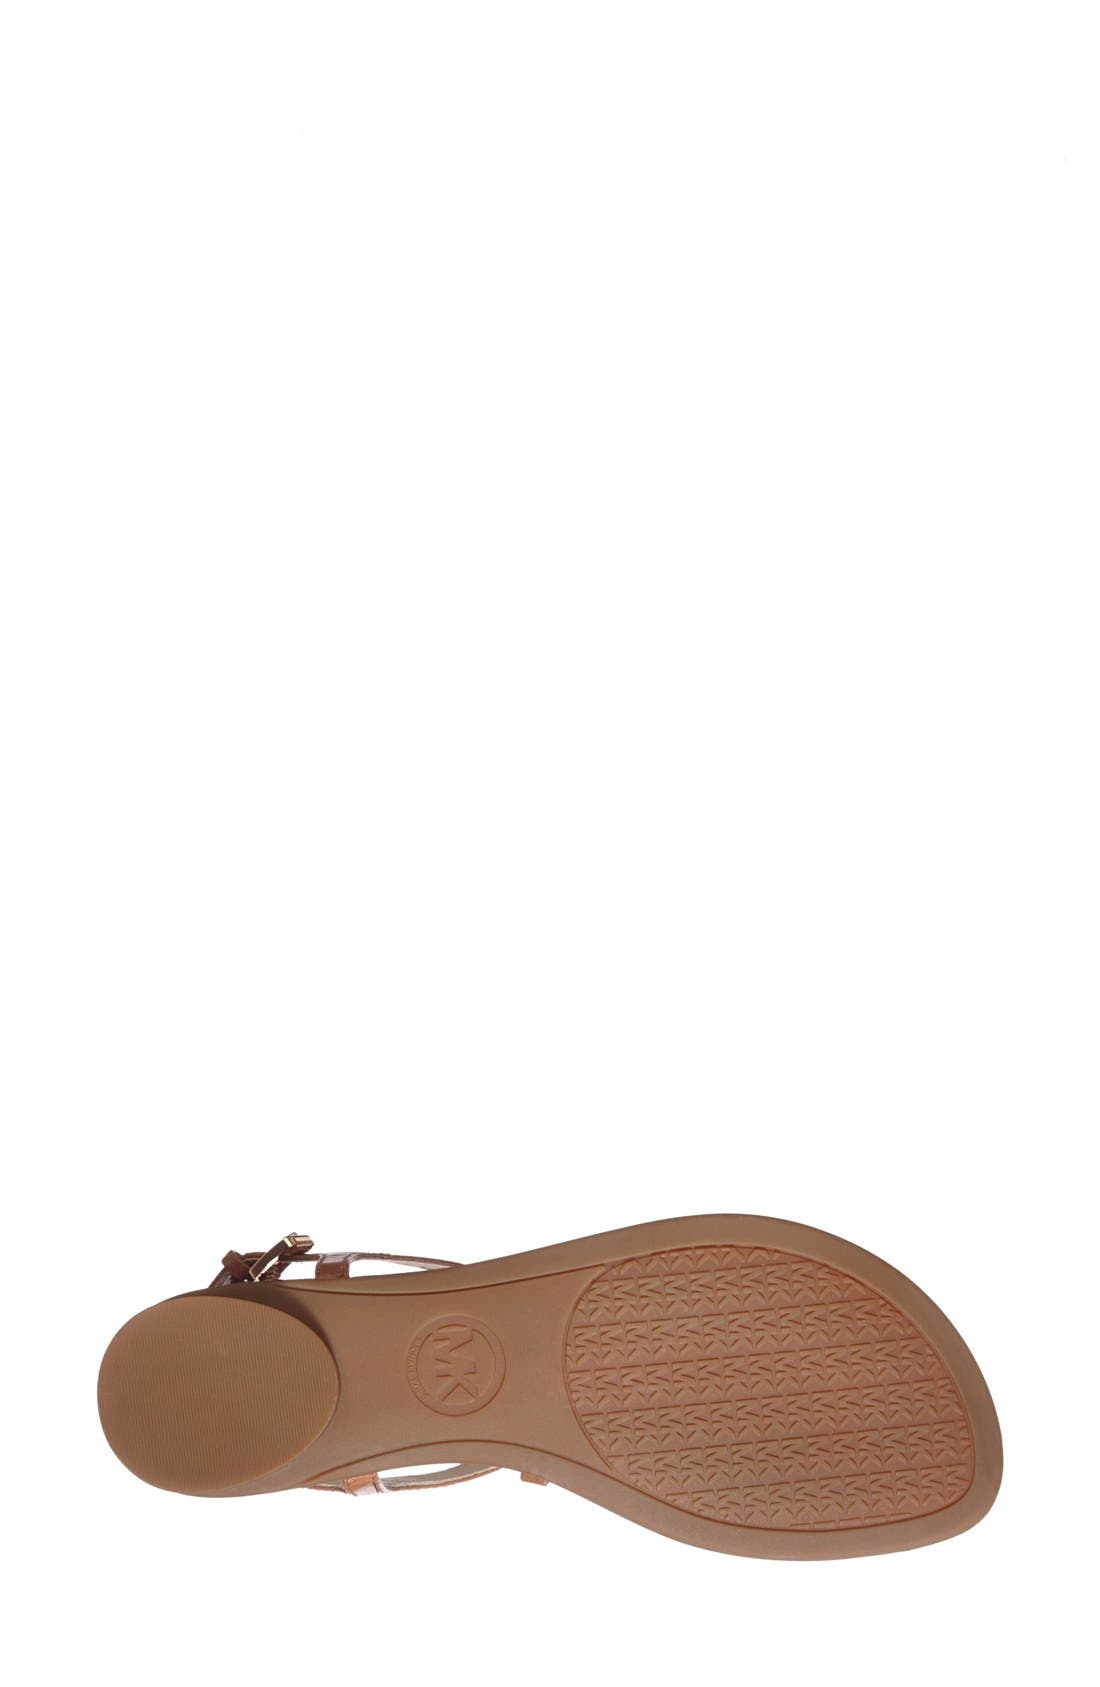 'Josie' T-Strap Leather Sandal,                             Alternate thumbnail 5, color,                             Luggage